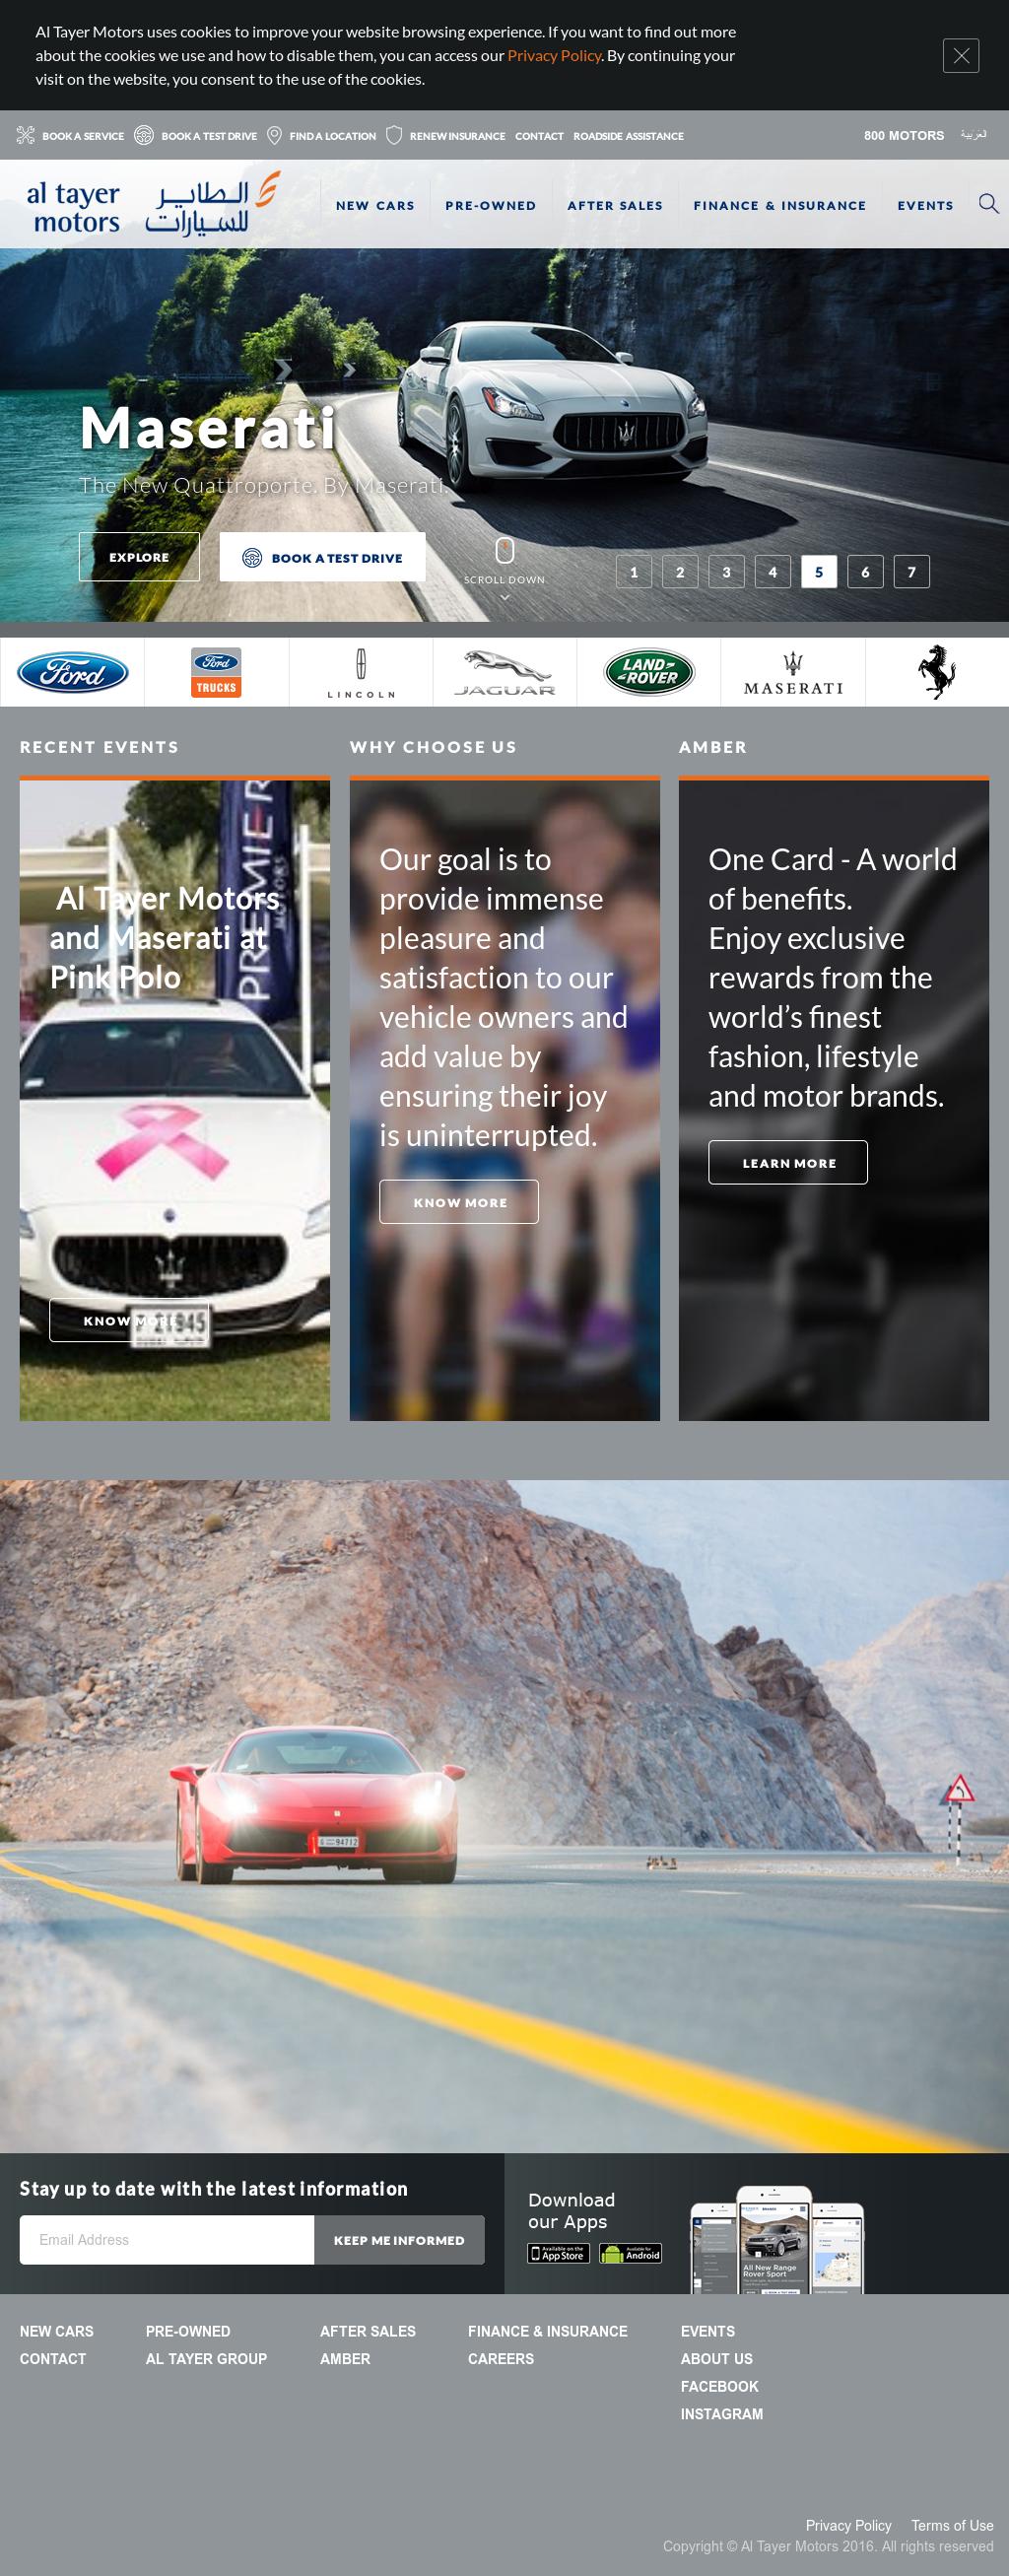 Al Tayer Motors's website screenshot on Feb 2017